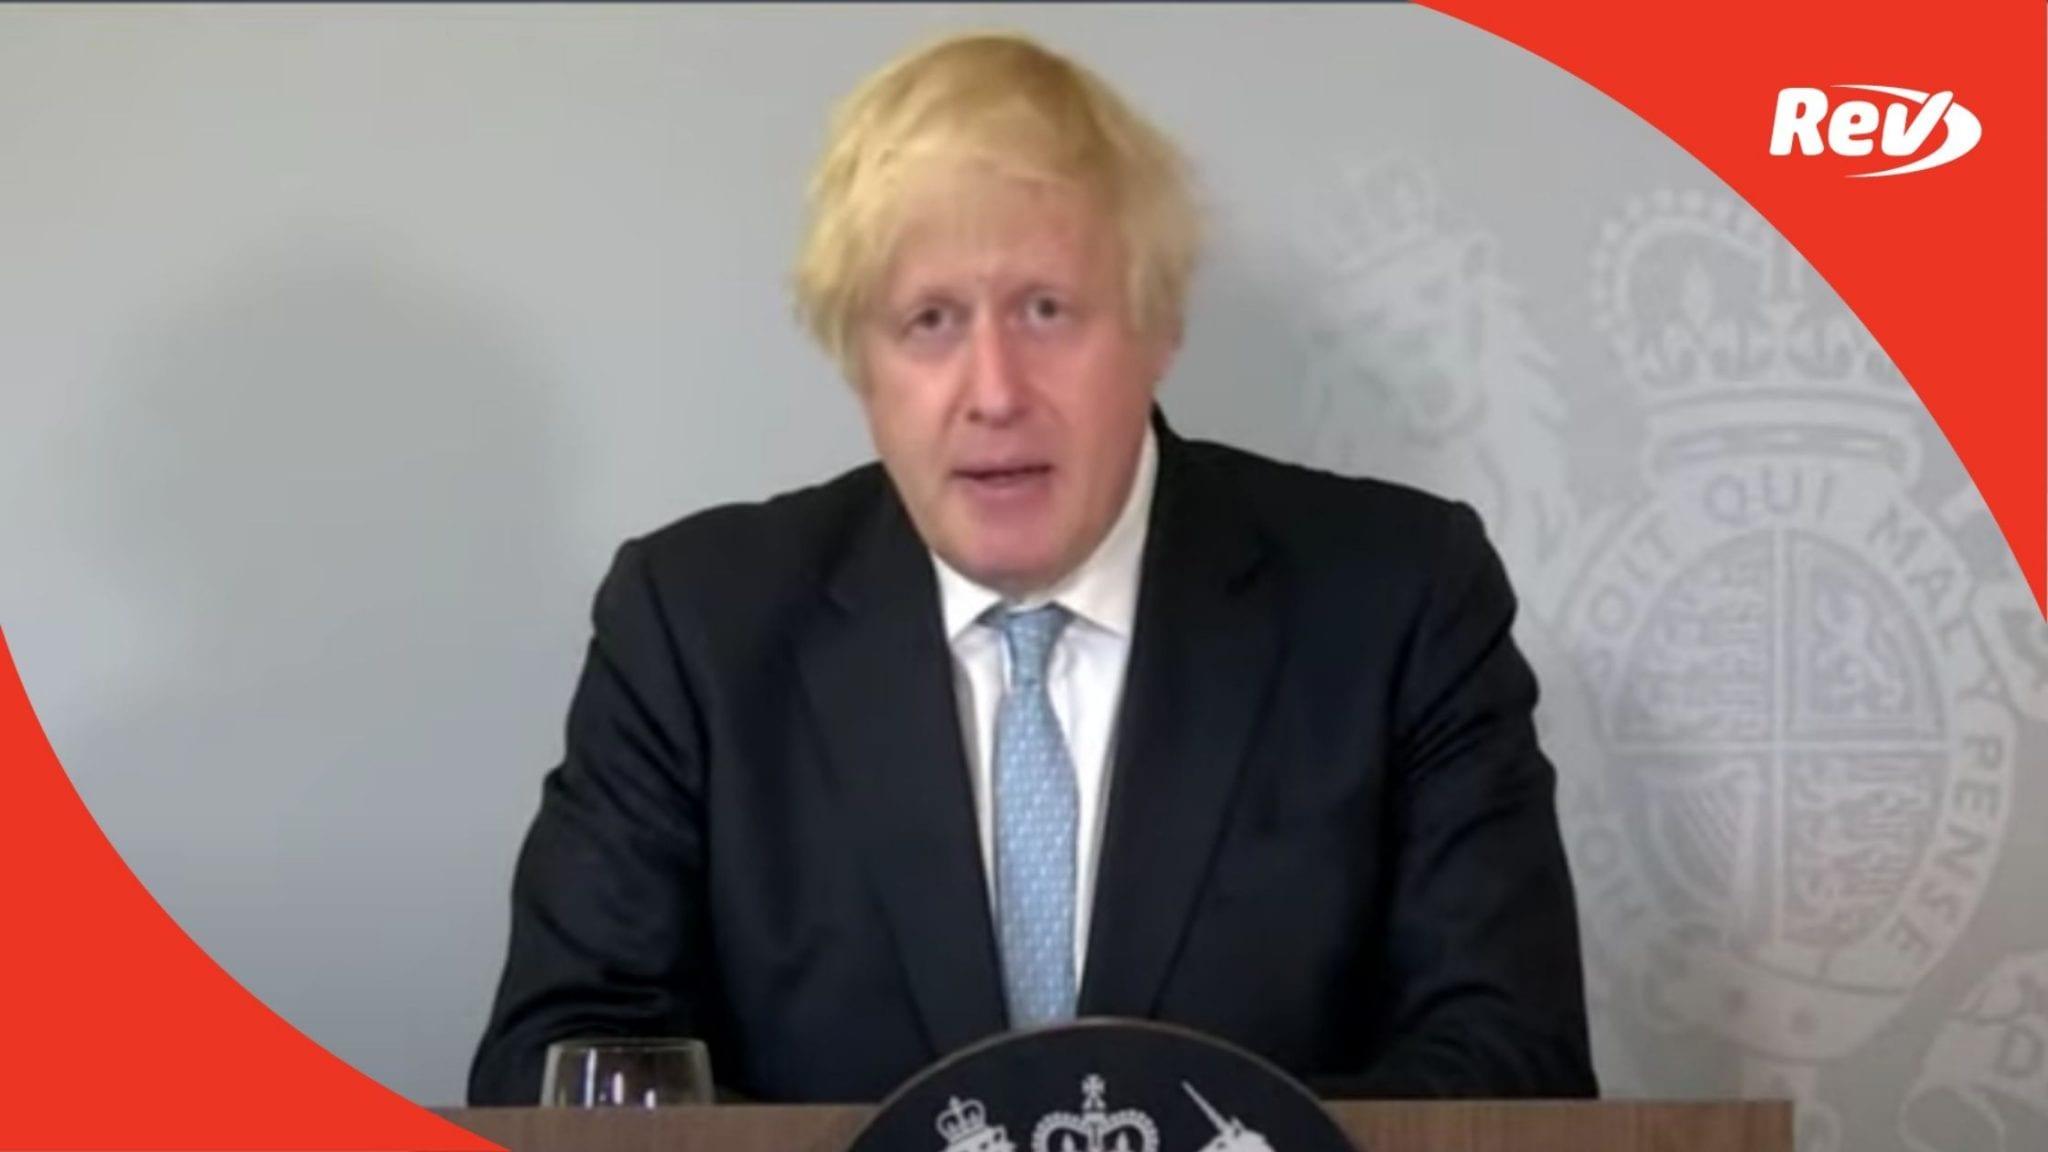 Boris Johnson News Briefing Transcript July 19: UK COVID-19 Restrictions Lifted